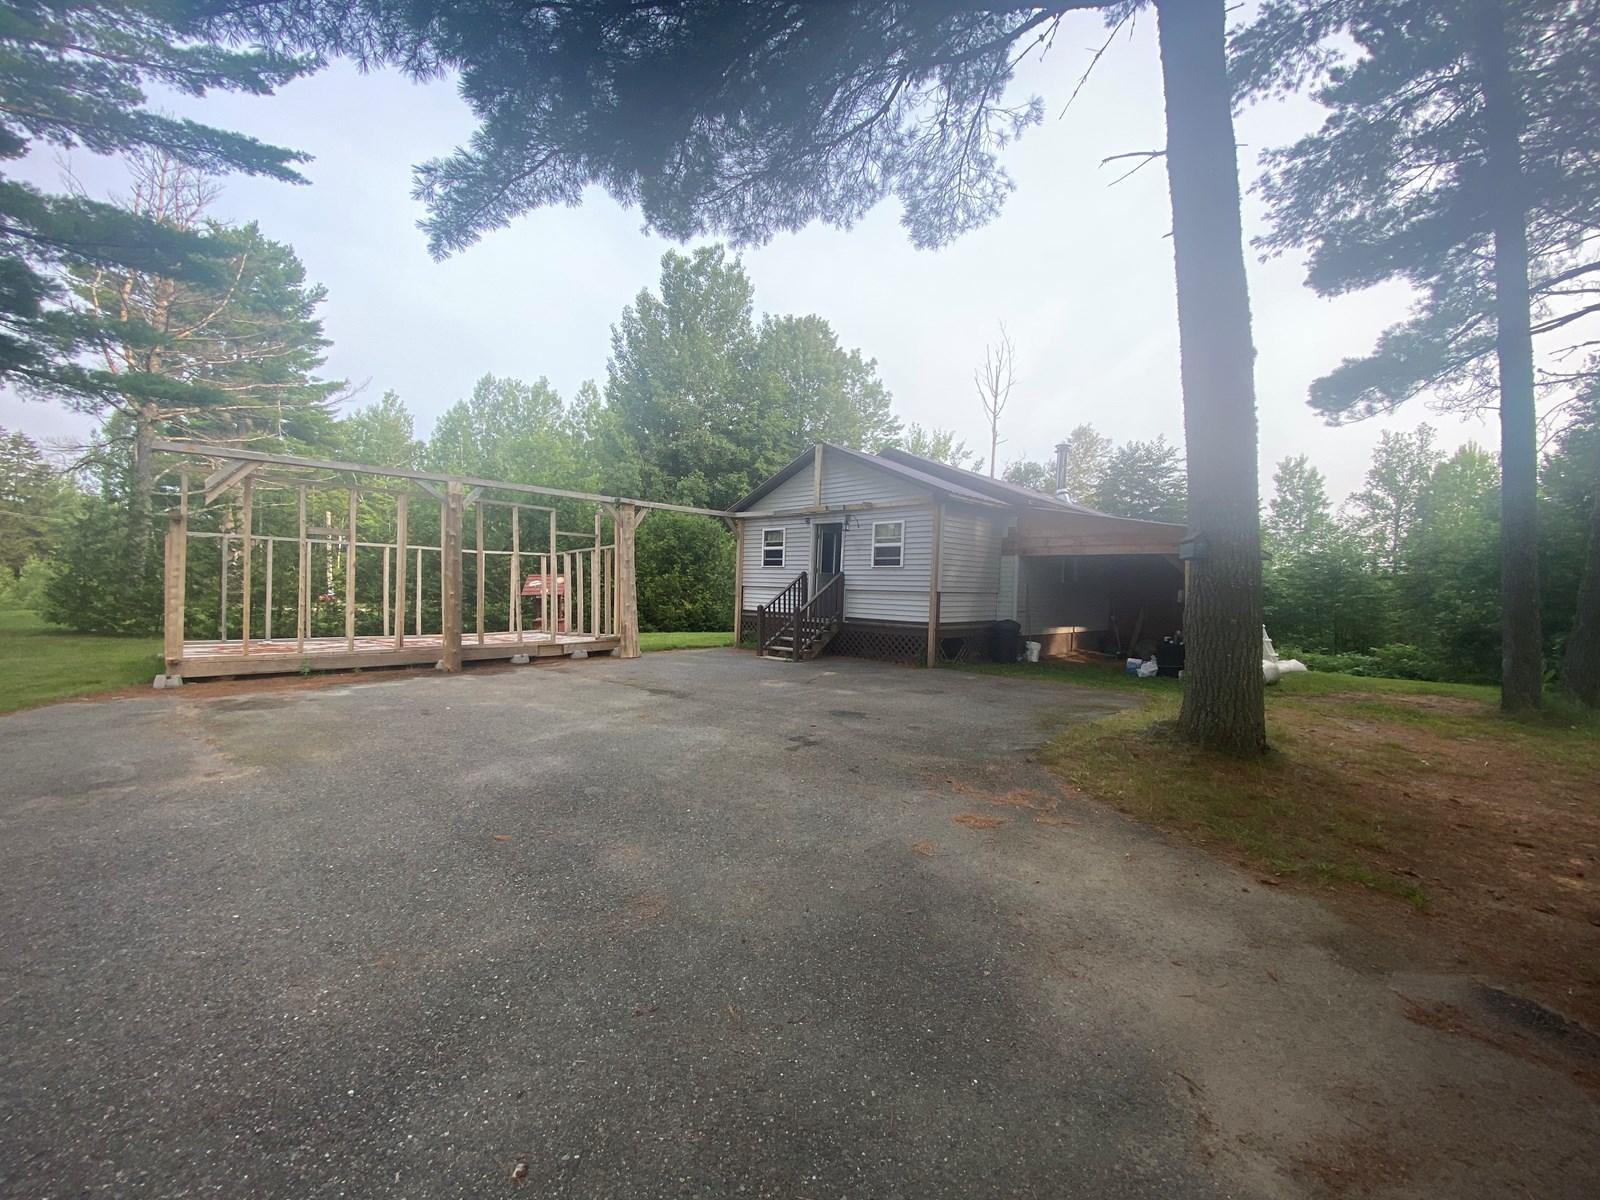 Camp for sale in Winn, Maine